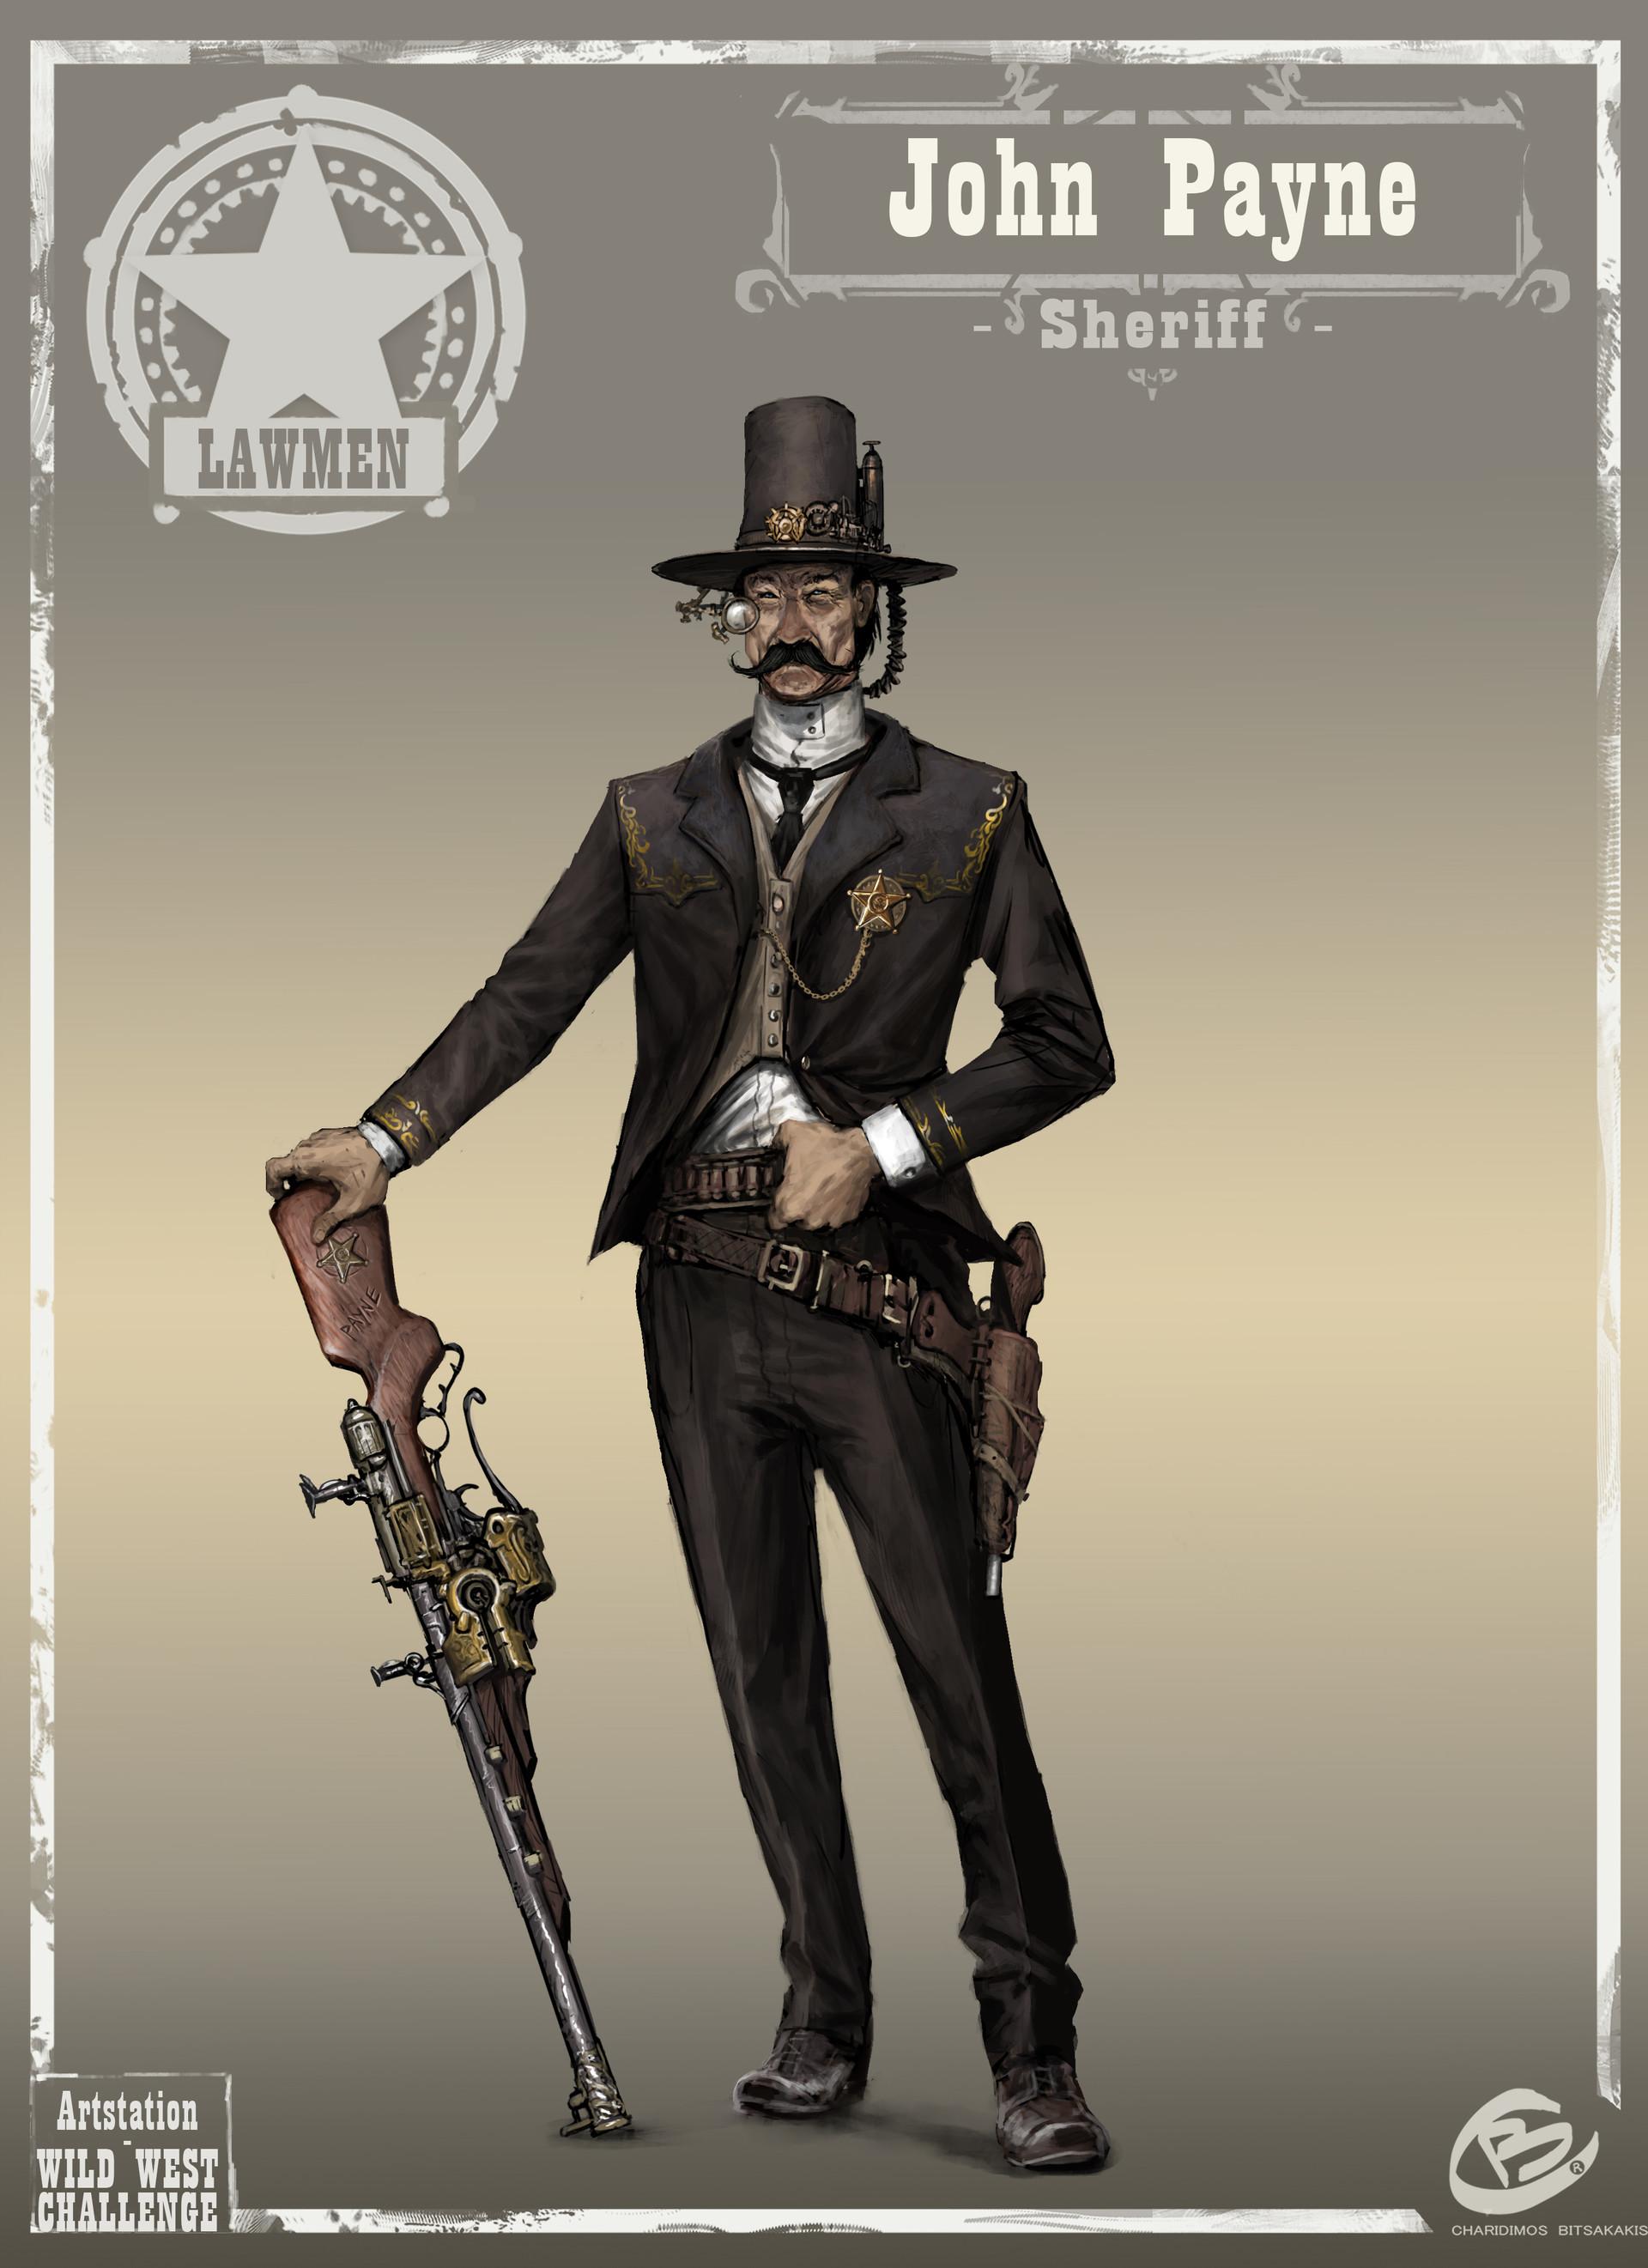 Lawmen - John Payne (Sheriff)